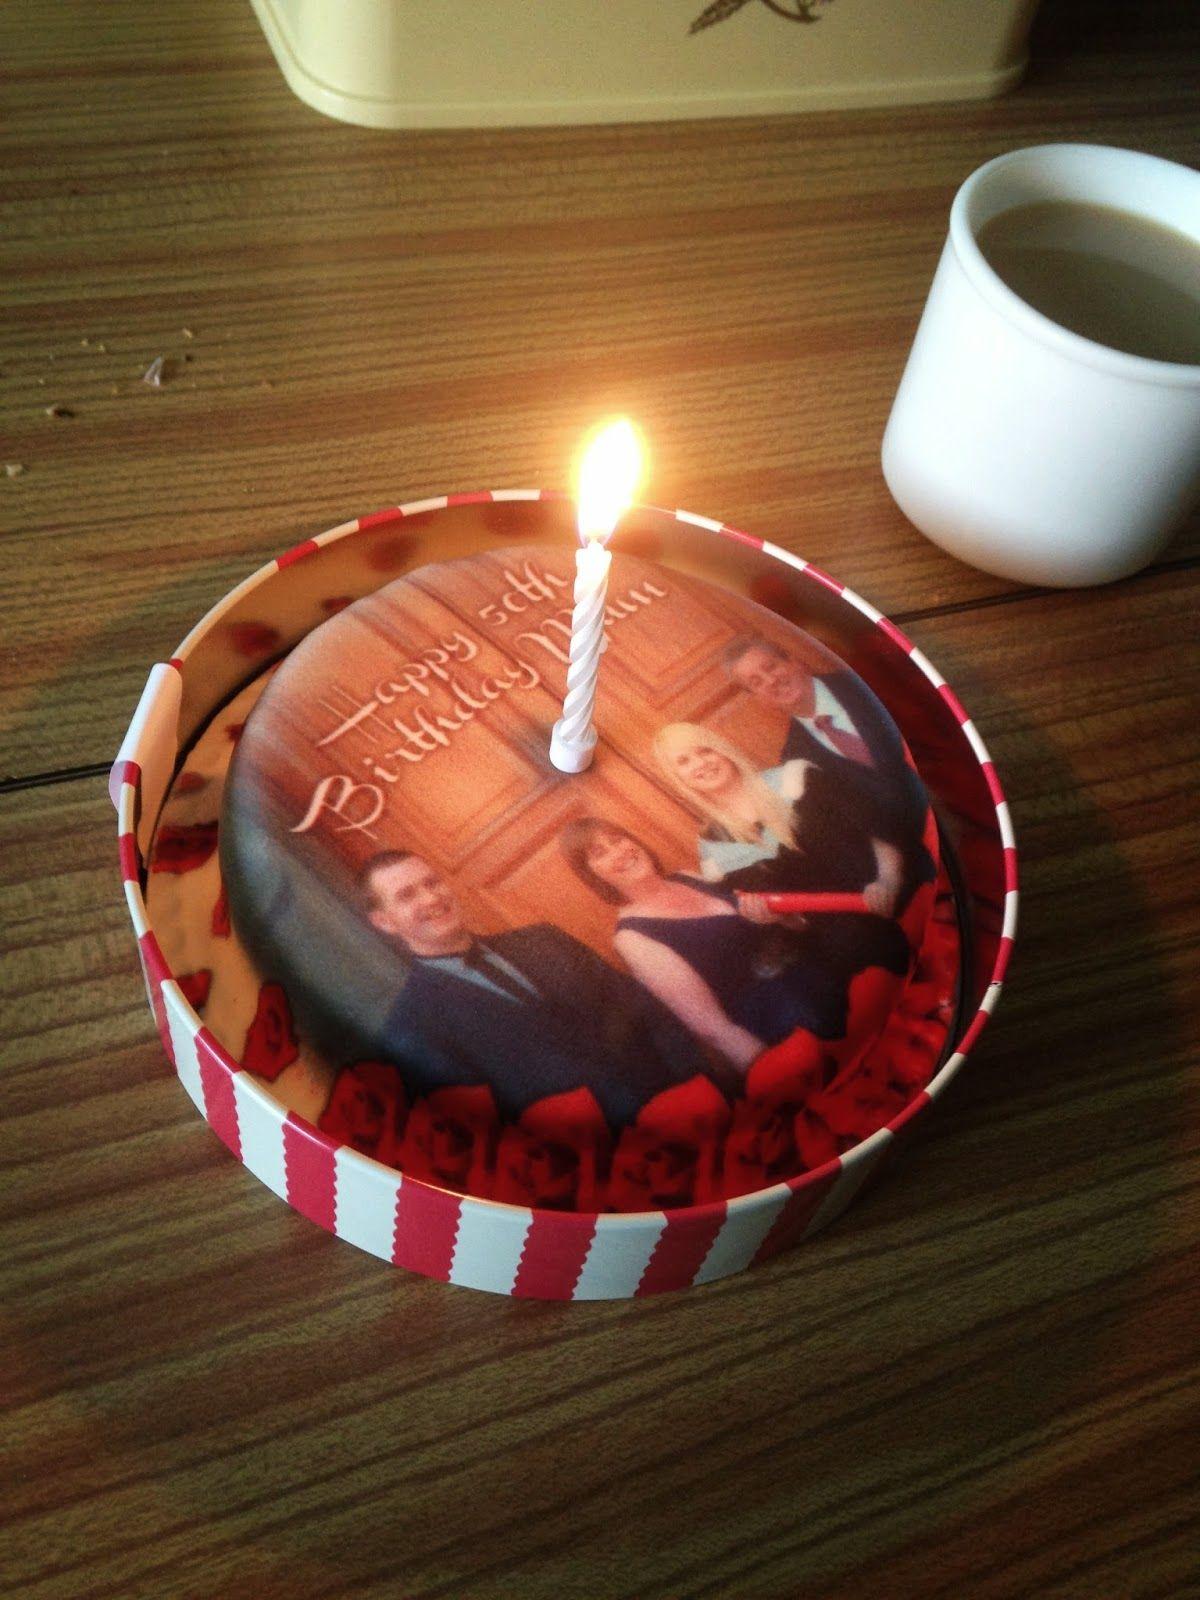 Bakerdays letterbox cake review letter box cake